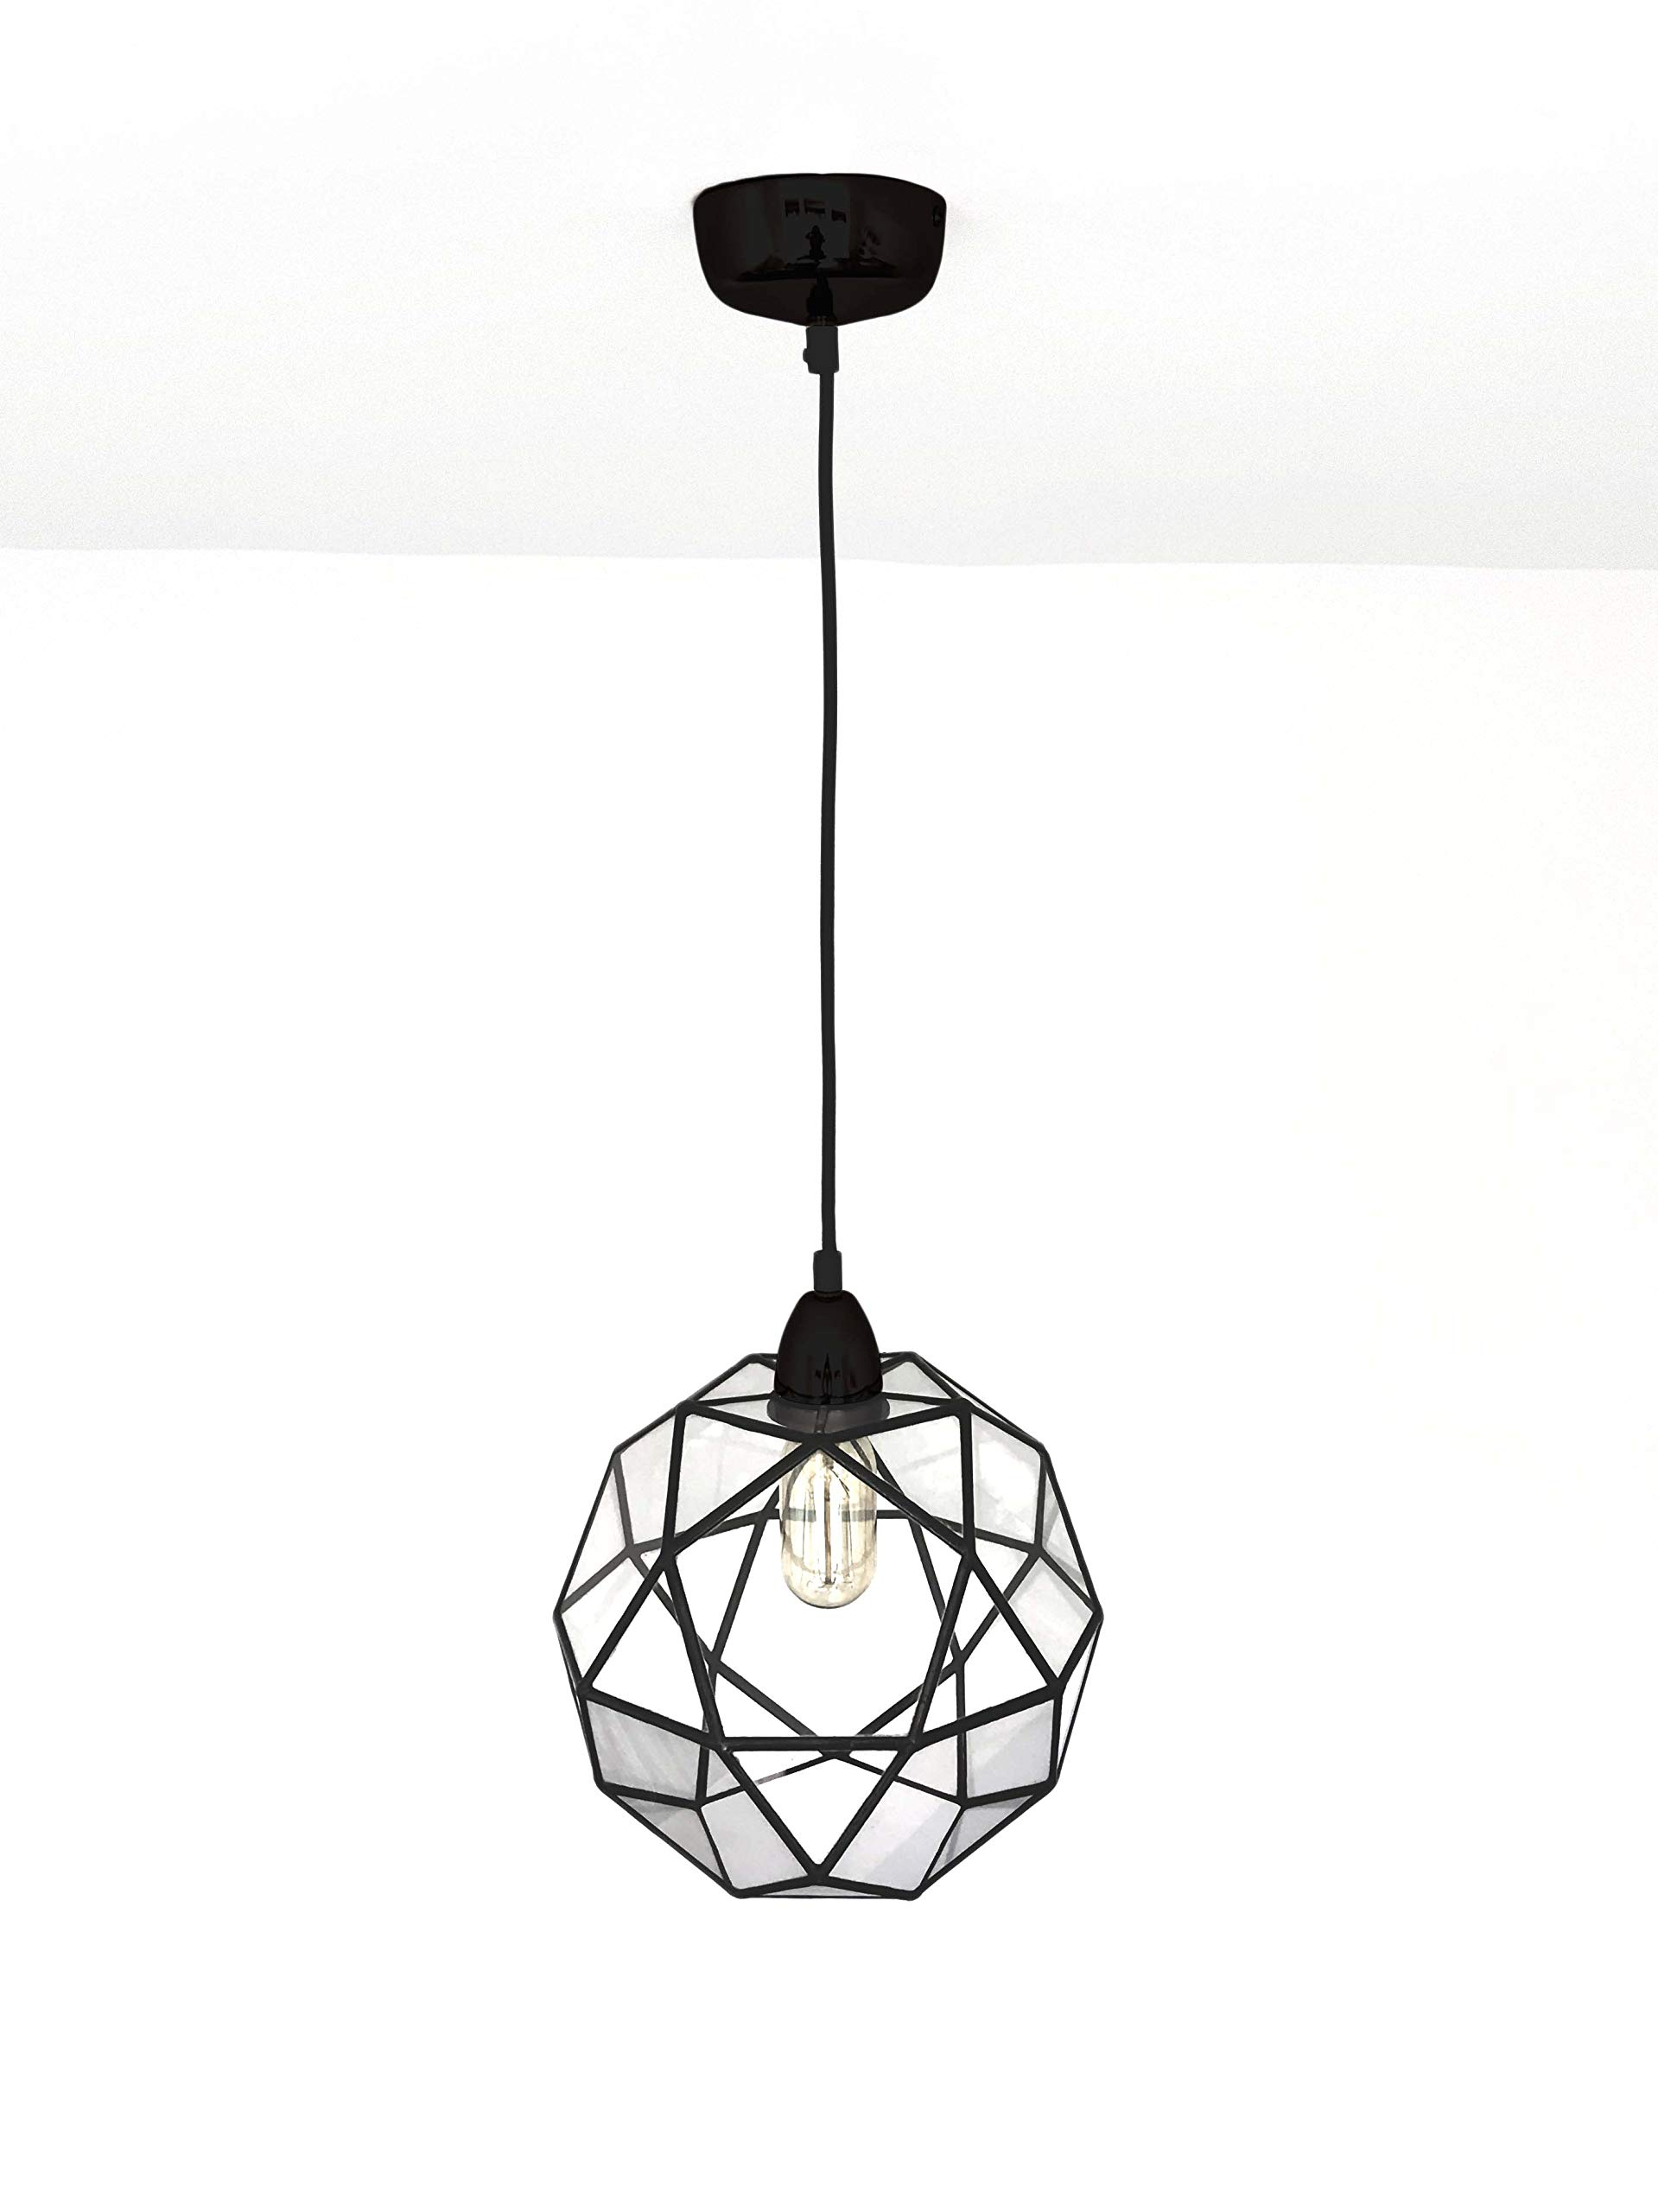 Icosidodecahedron ChandelierGeometric Glass Light PendantHandmade in England (Medium, Black)